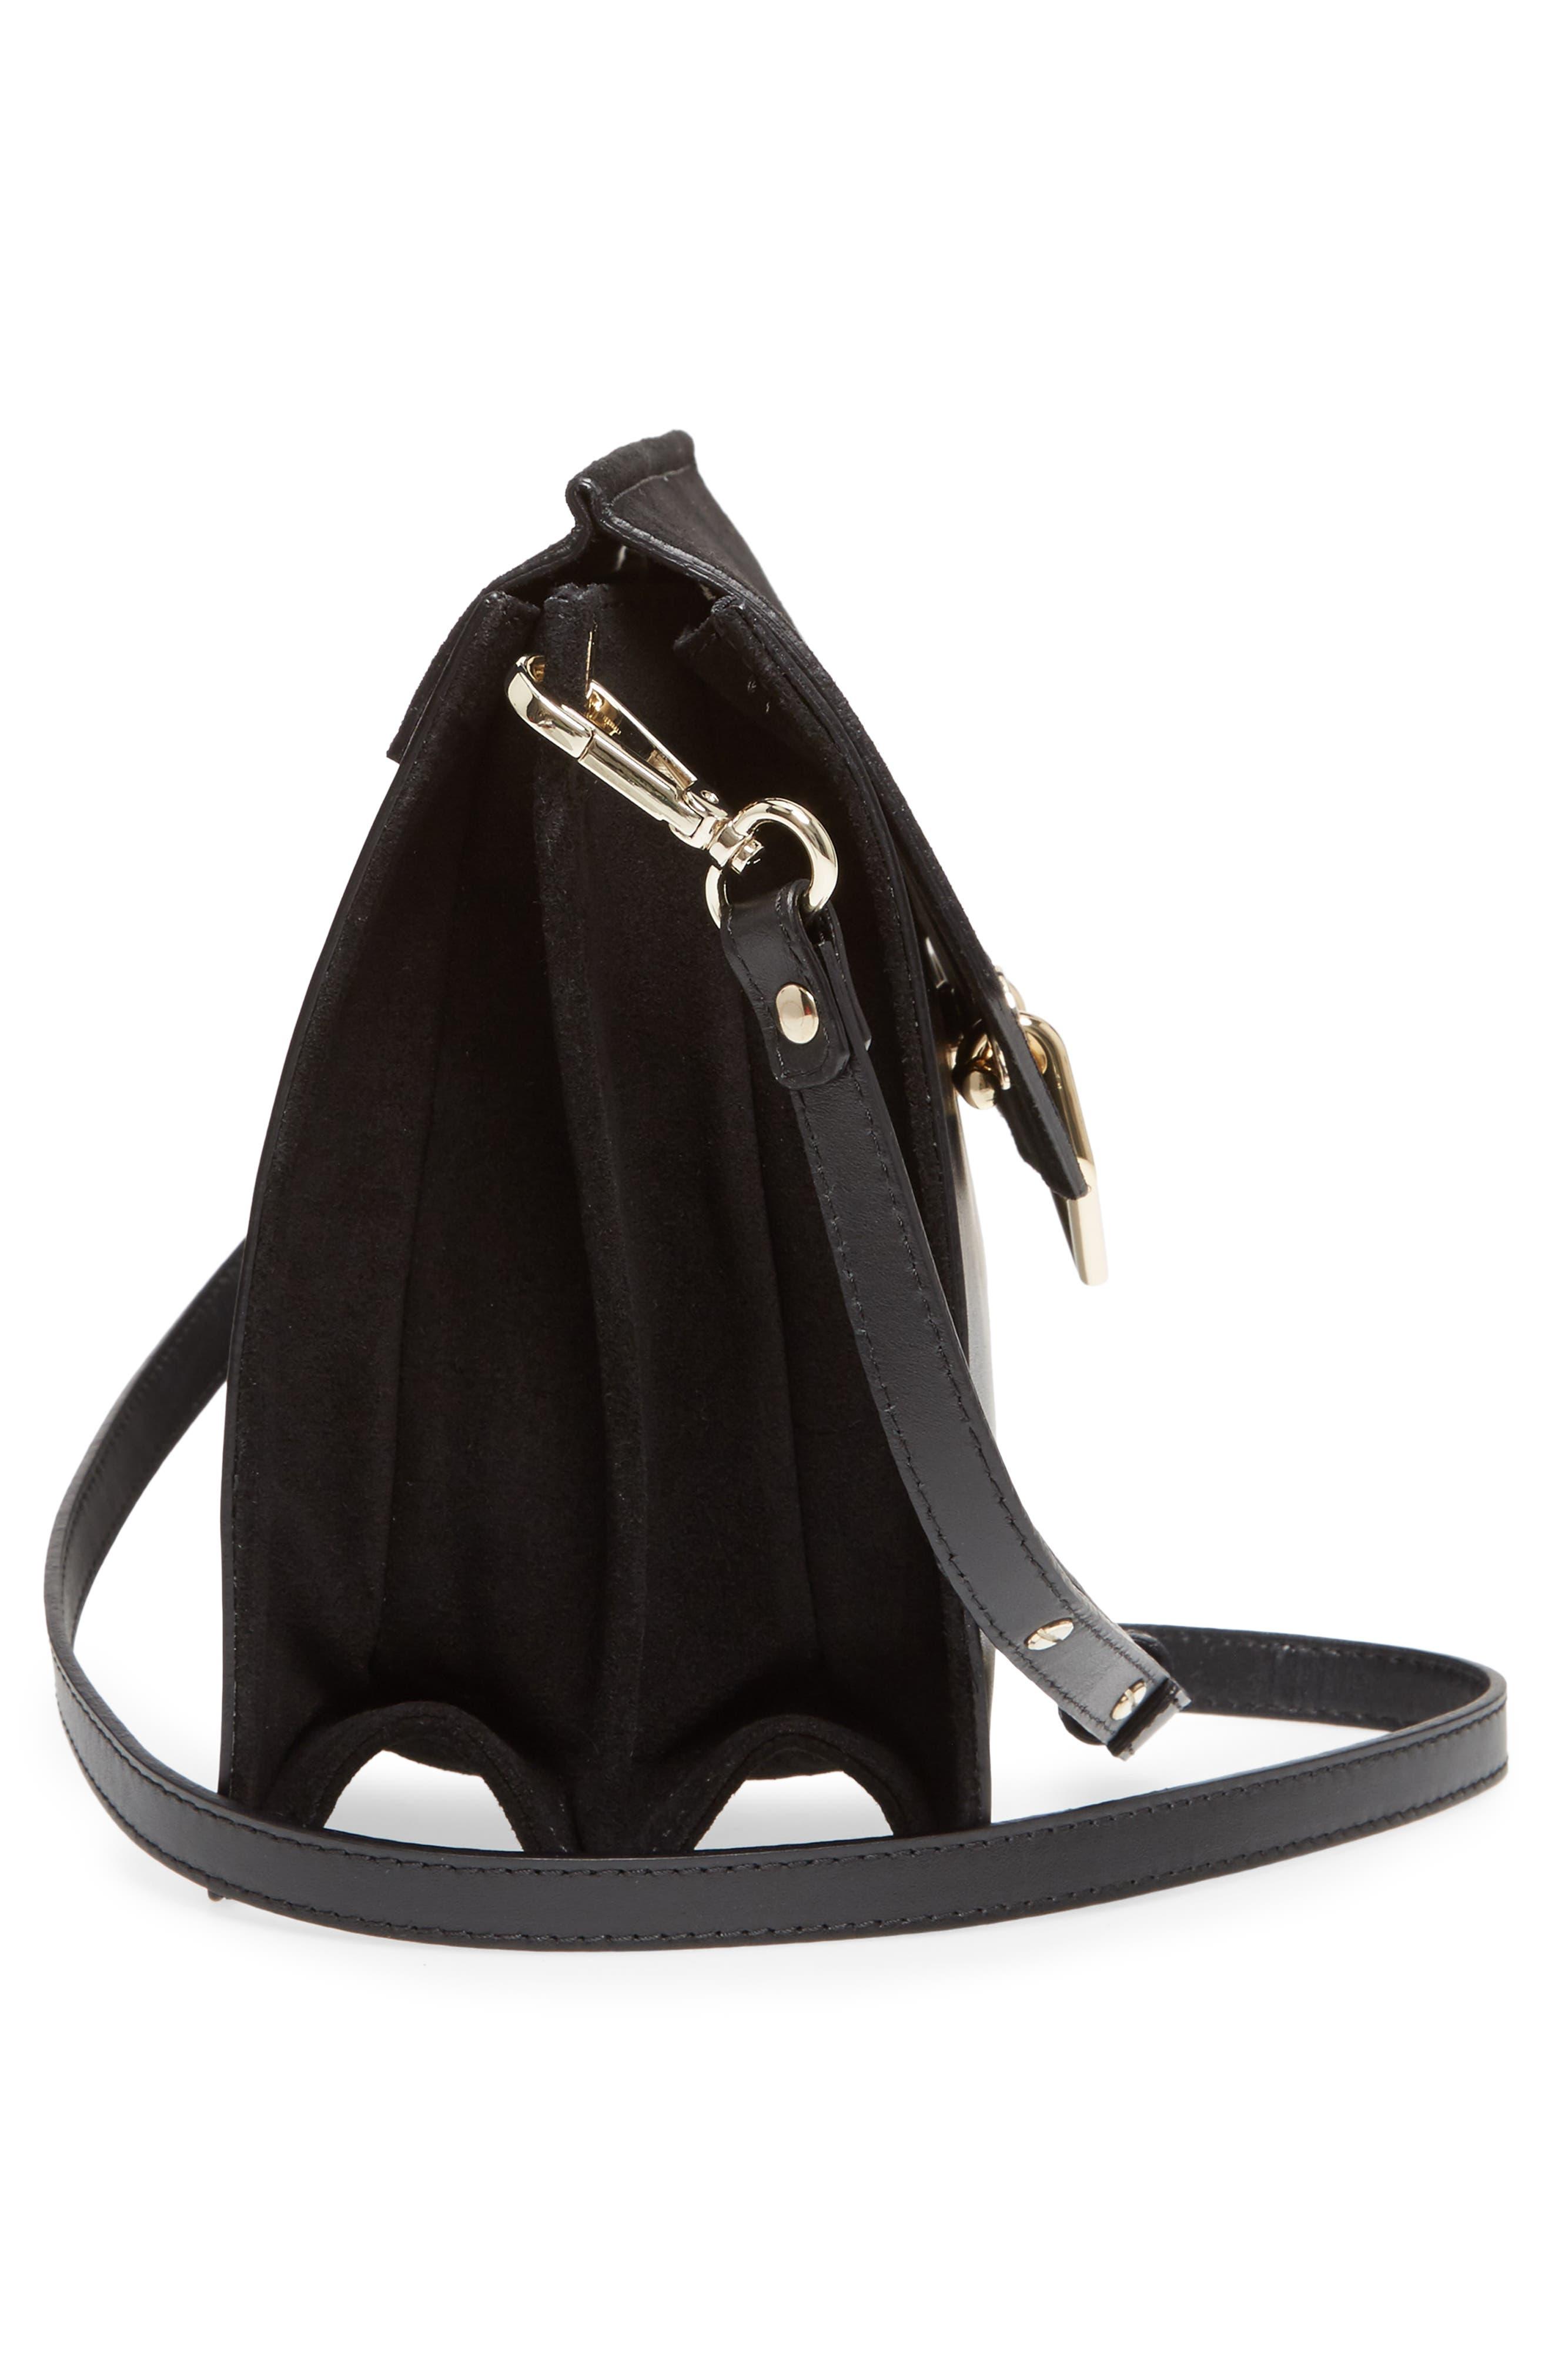 Premium Leather & Suede Soko Shoulder Bag,                             Alternate thumbnail 4, color,                             Black